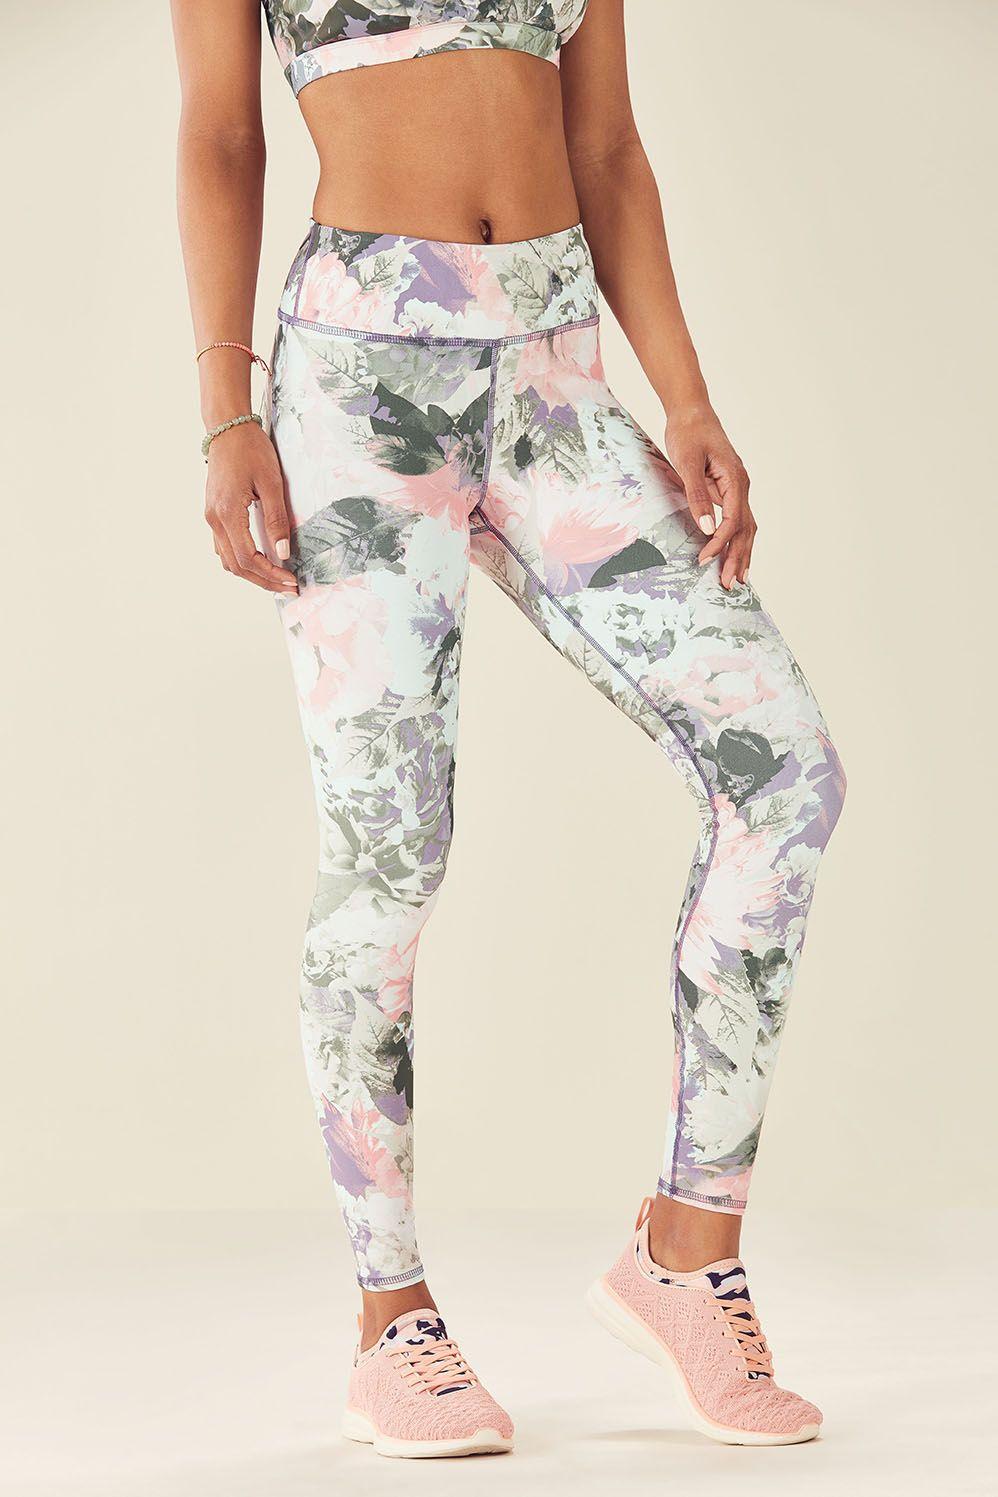 17a3664ead2c41 Salar Printed PowerHold® Legging in 2019 | My Style | Women's ...